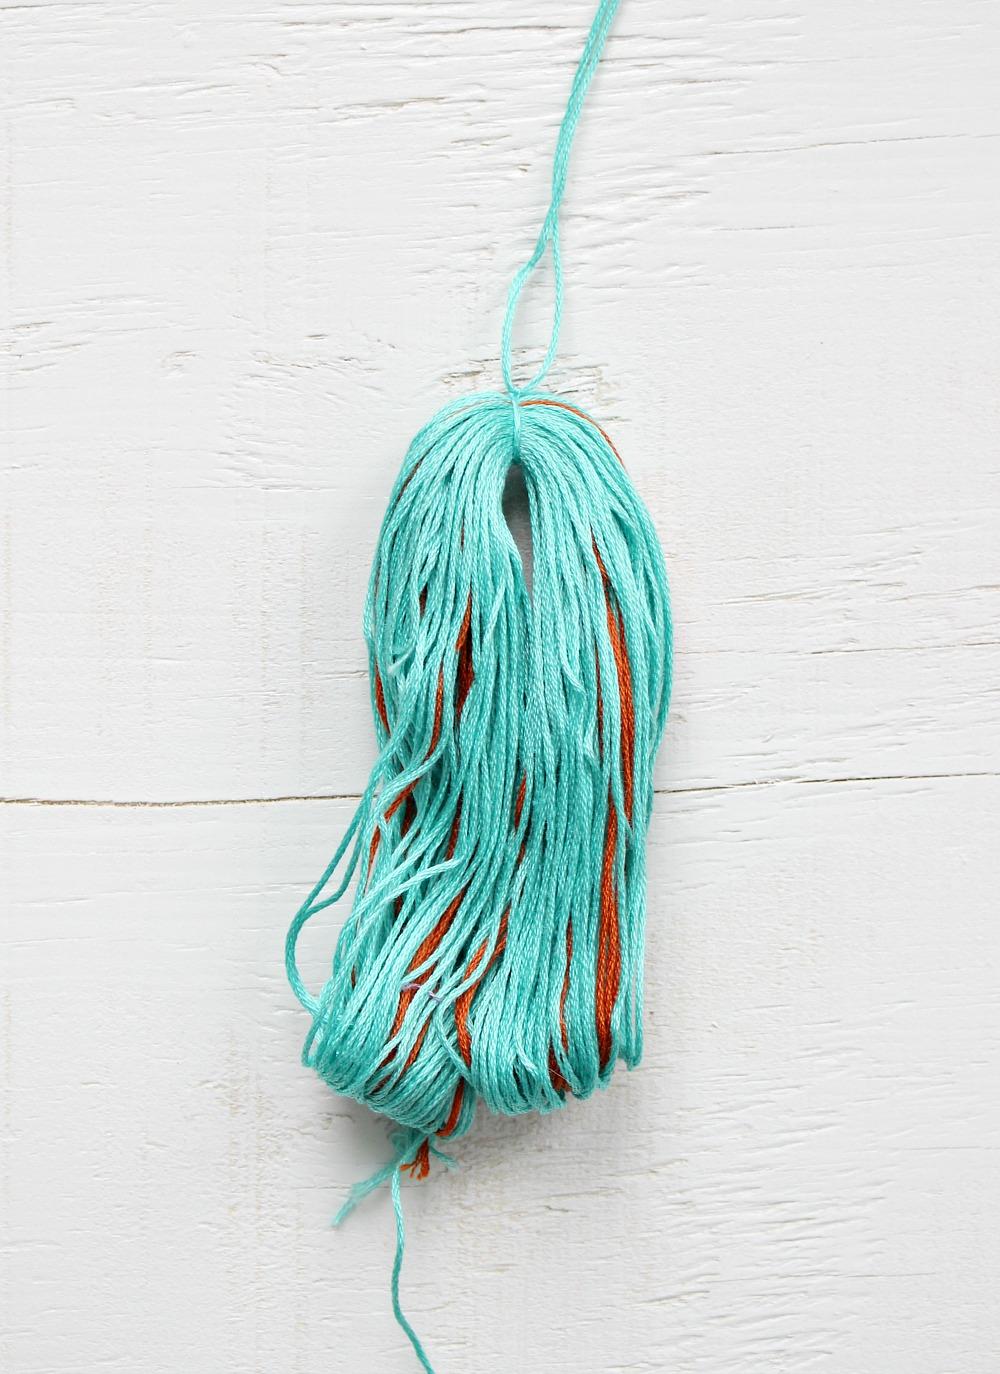 Embroidery Thread Project Idea